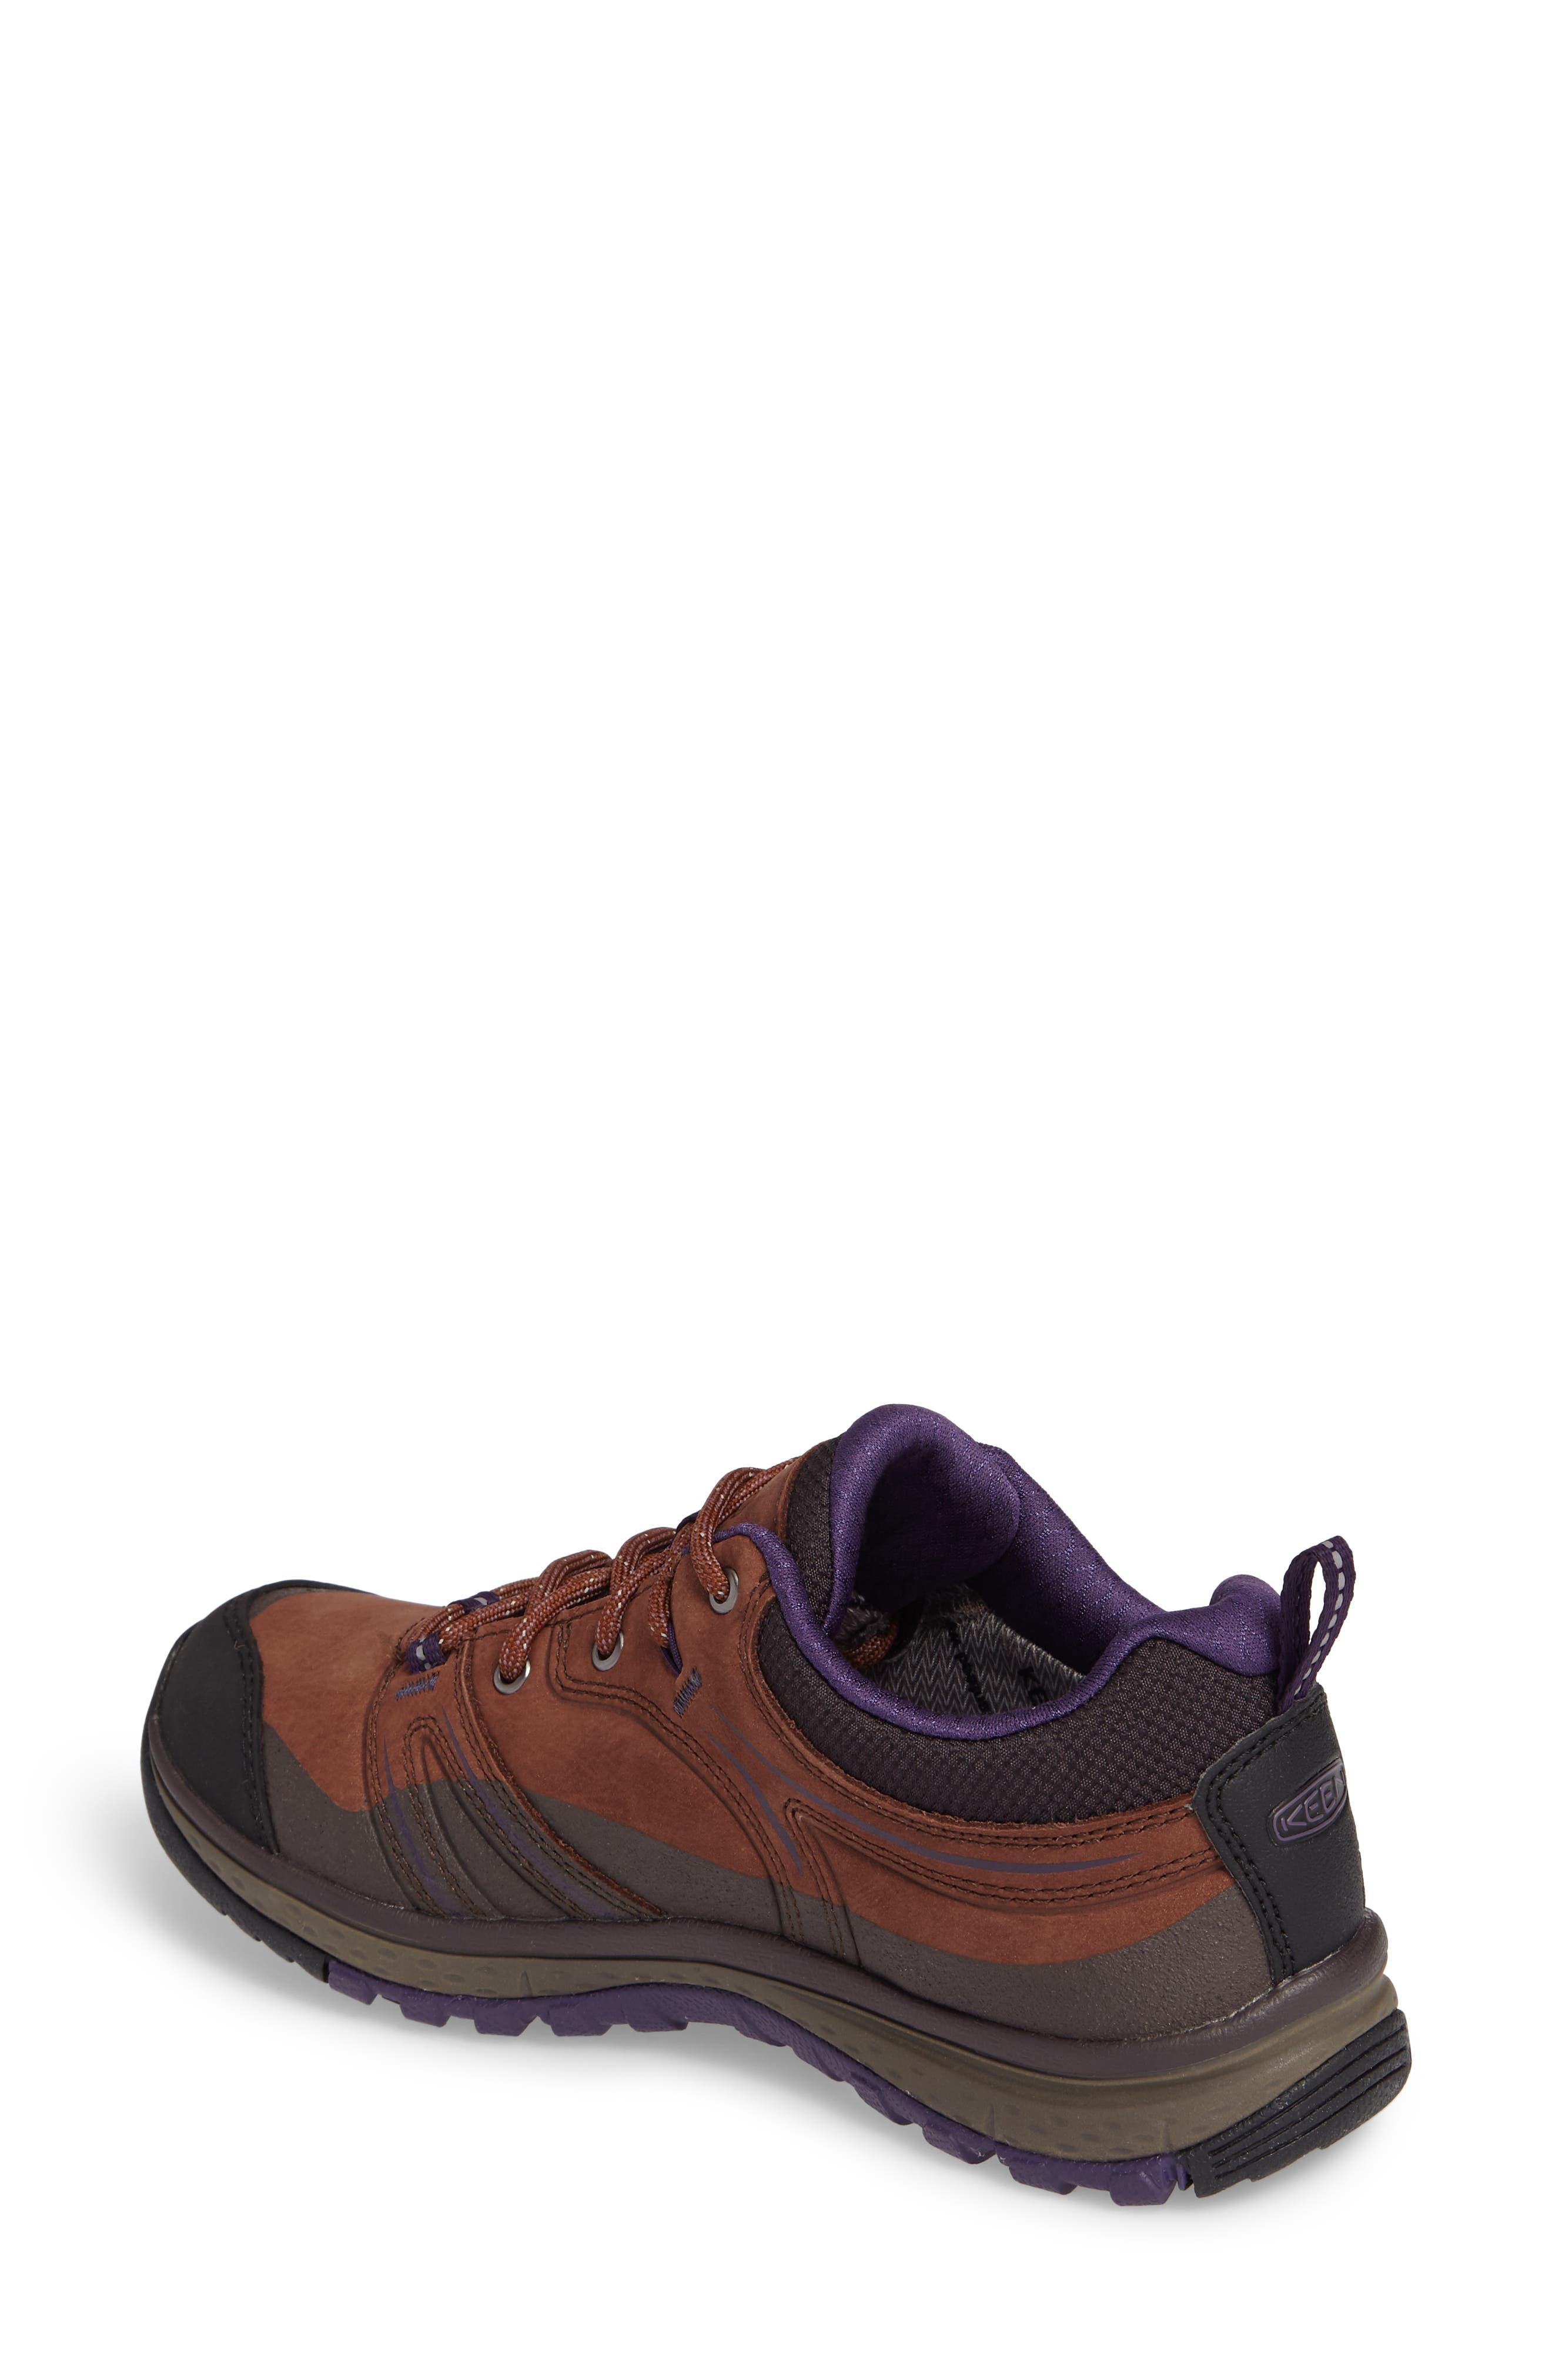 Terradora Waterproof Hiking Shoe,                             Alternate thumbnail 6, color,